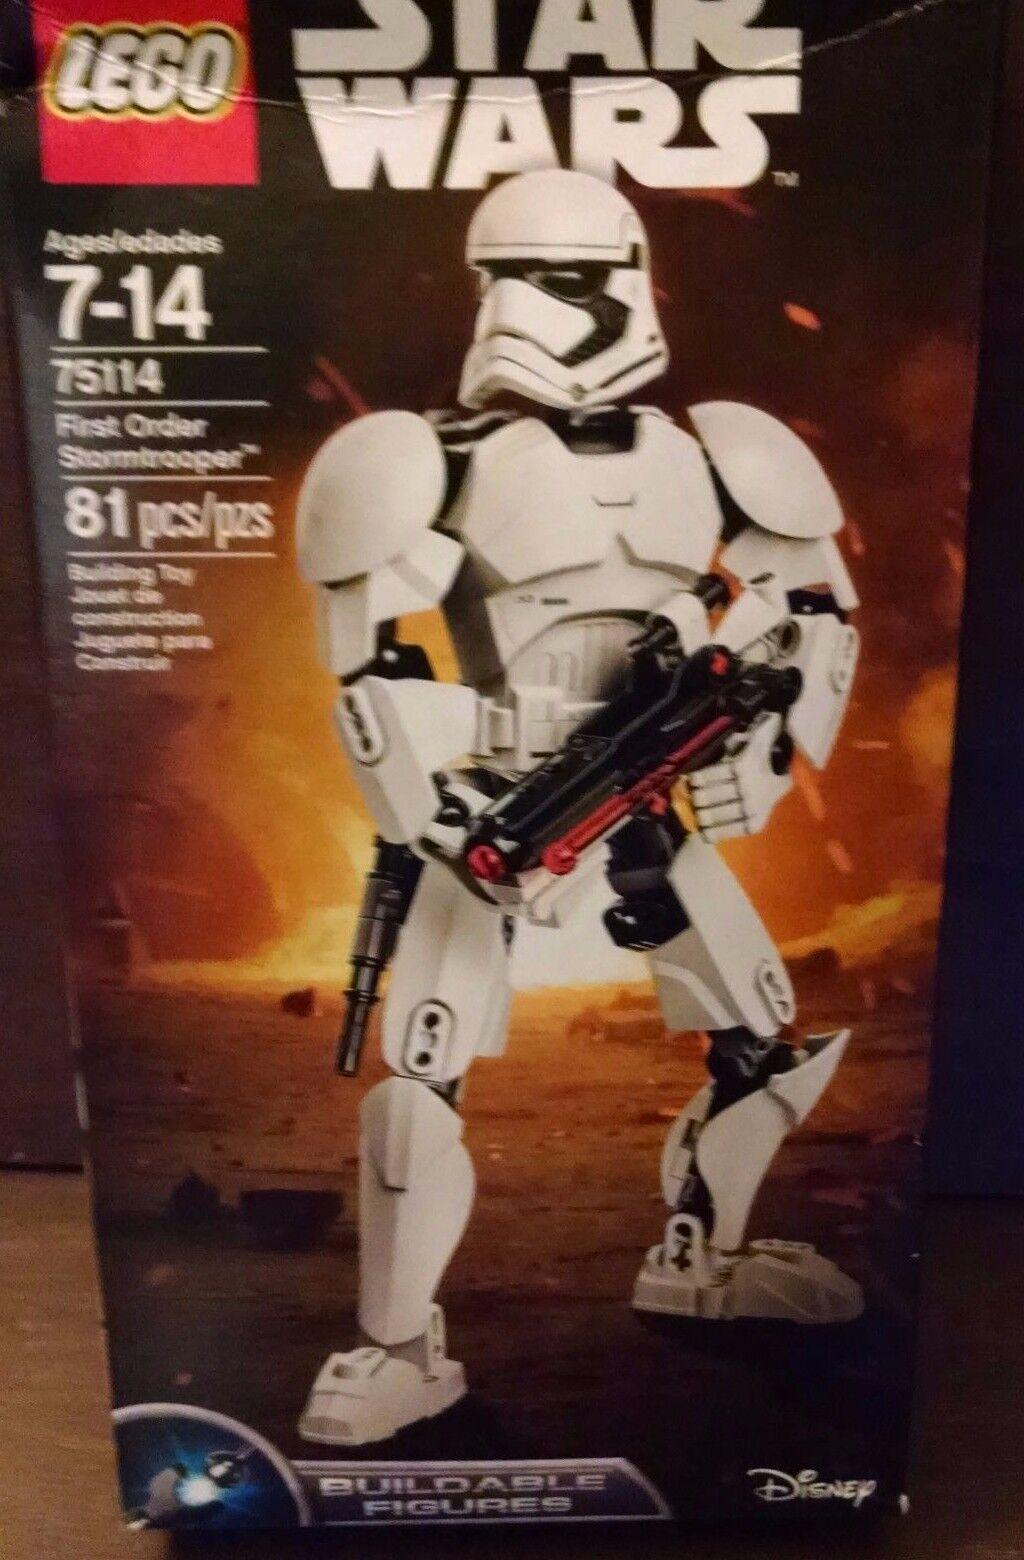 LEGO Star Wars 81 pcs. First Order Stormtrooper 75114  New 2016